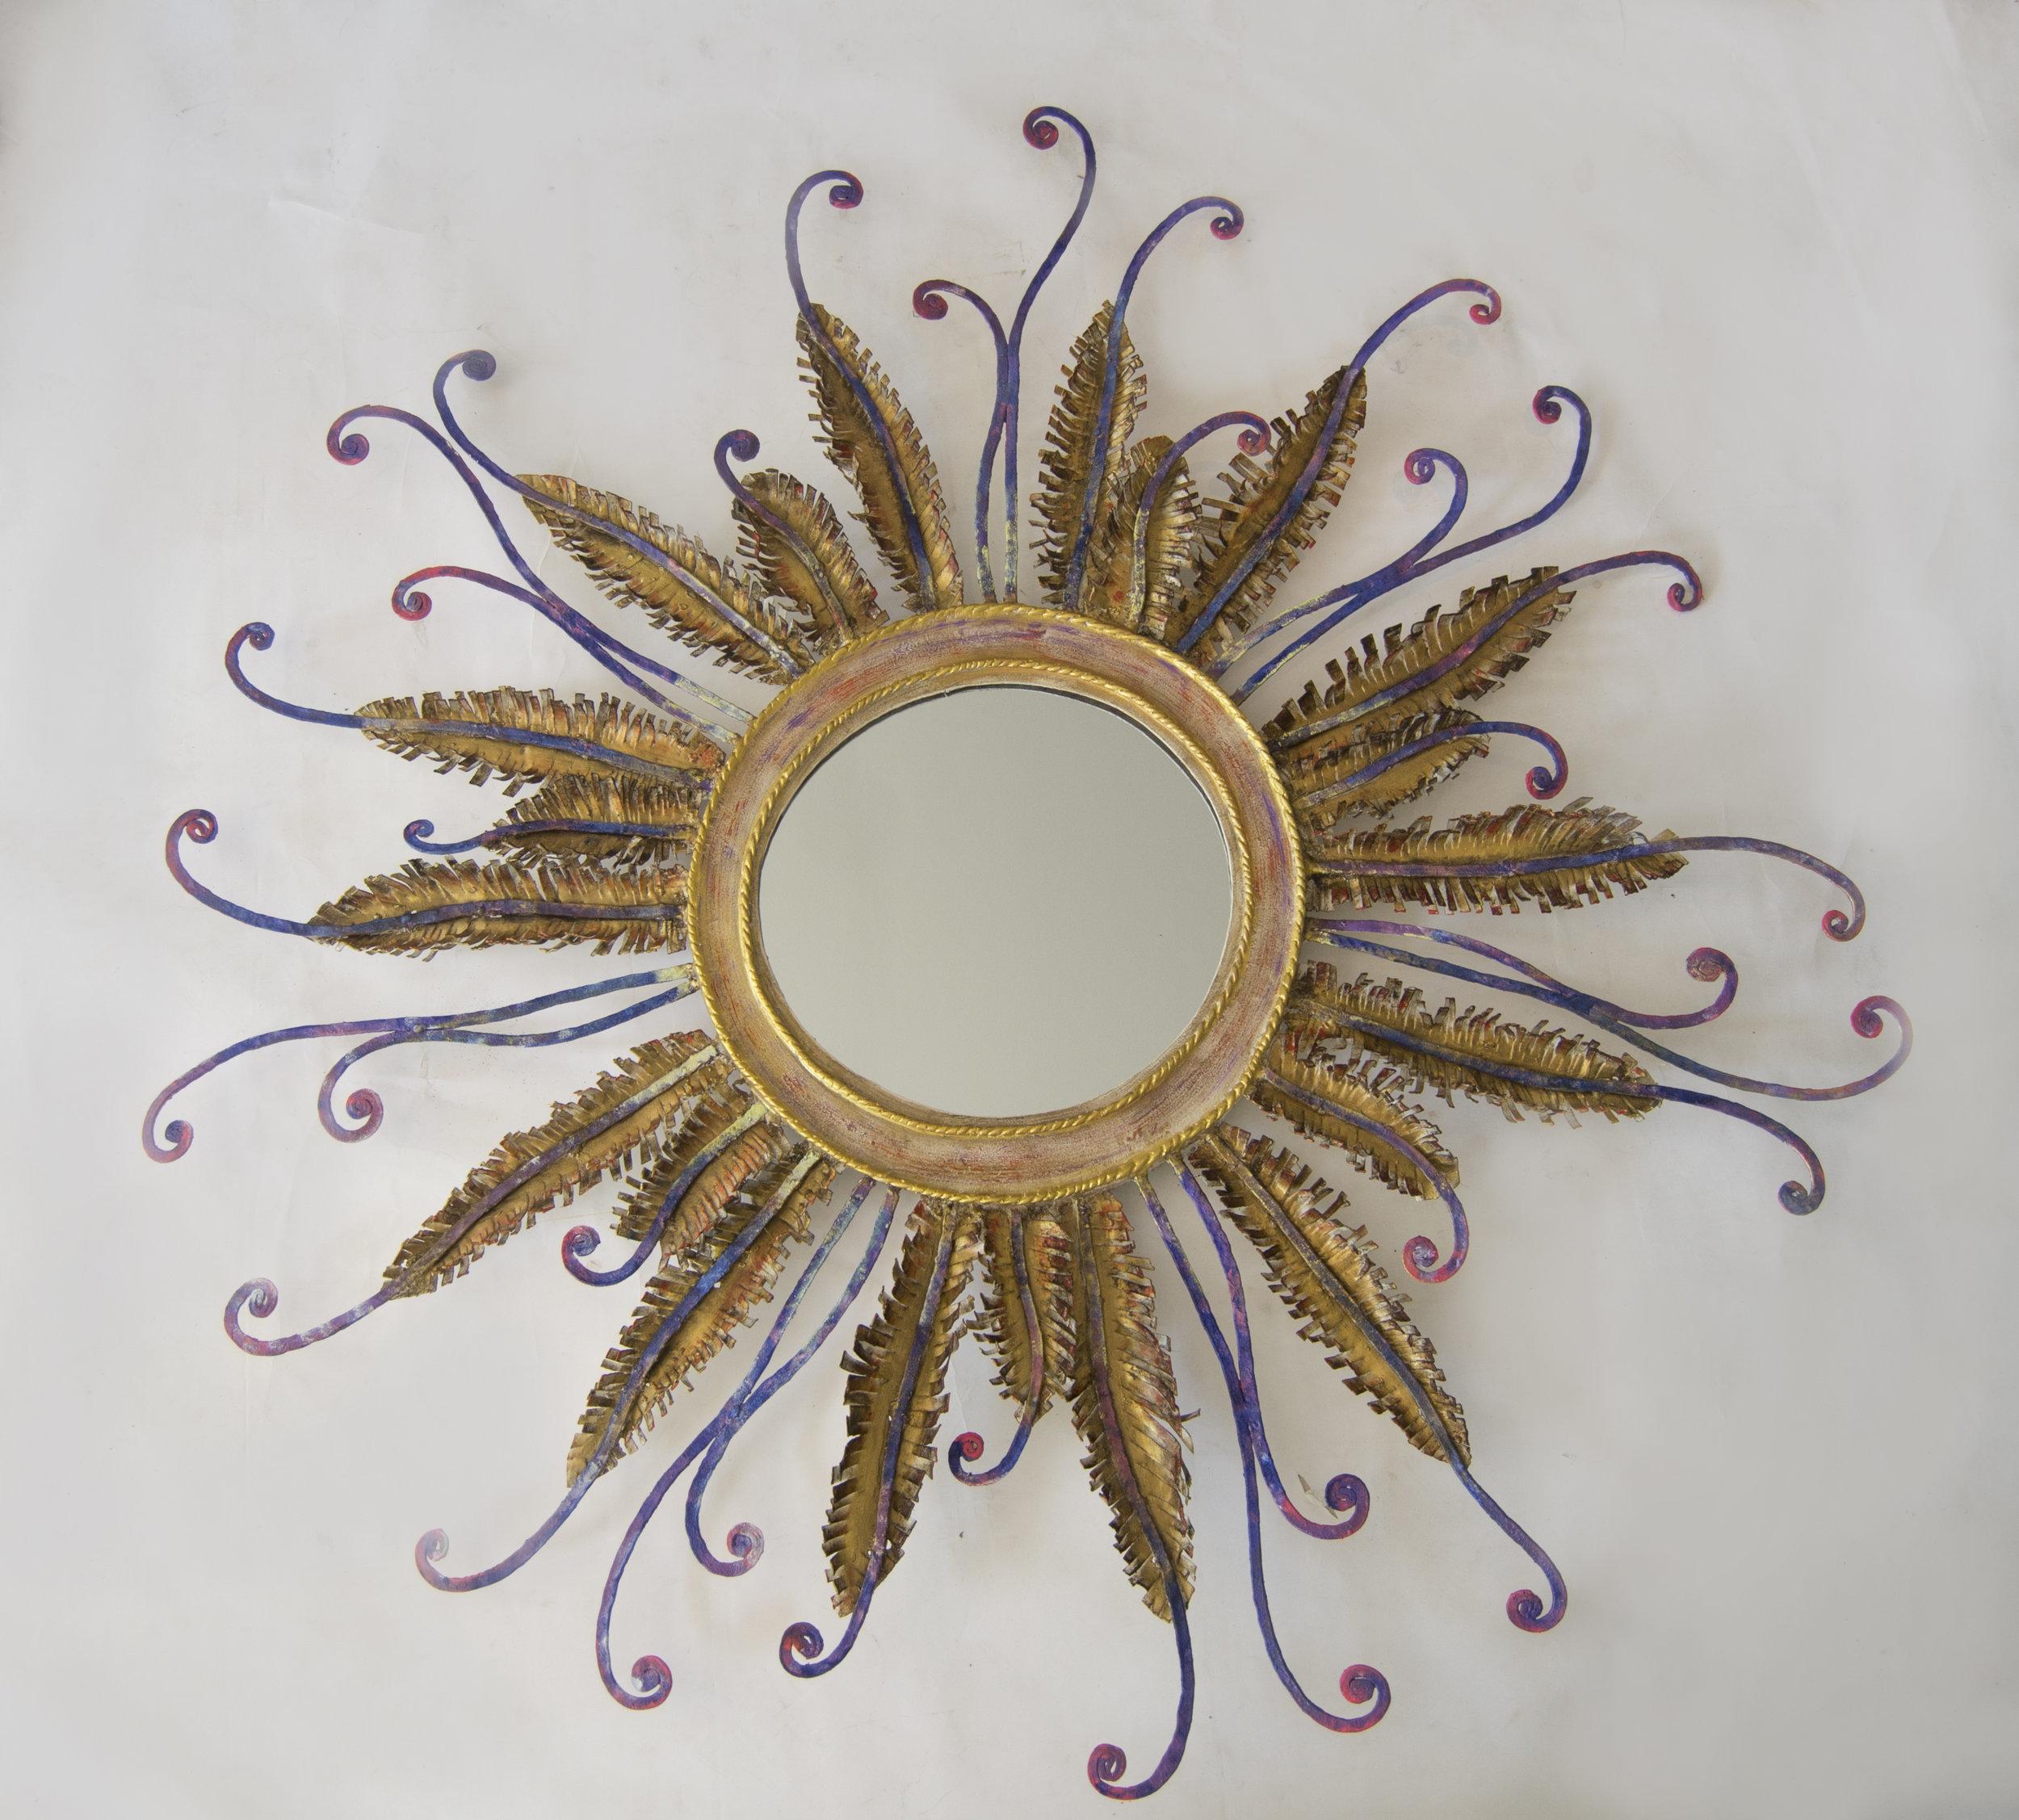 Peacock Mirror by Constance Swaniker